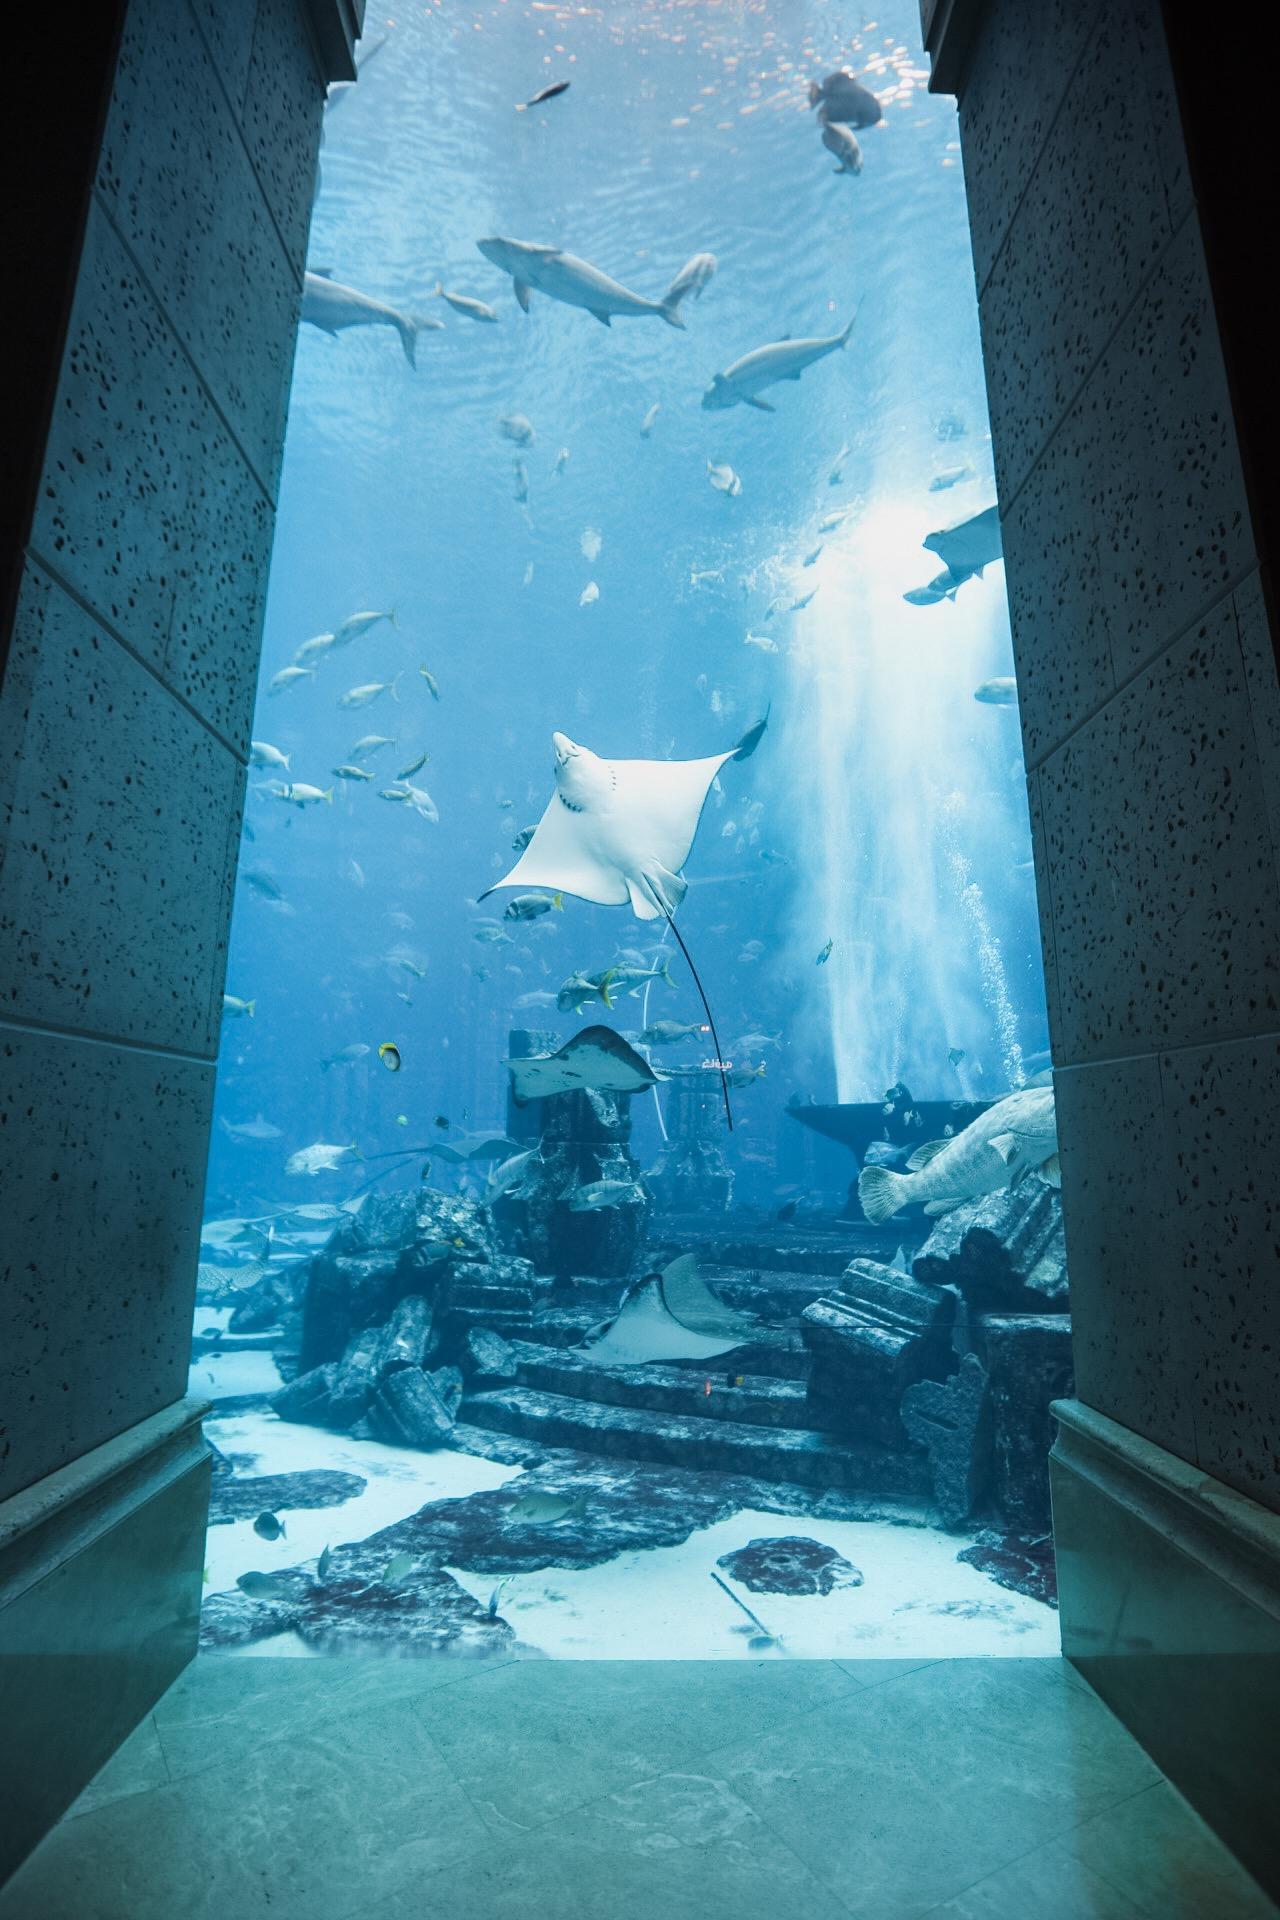 dubai_aquarium_atlantis.JPG